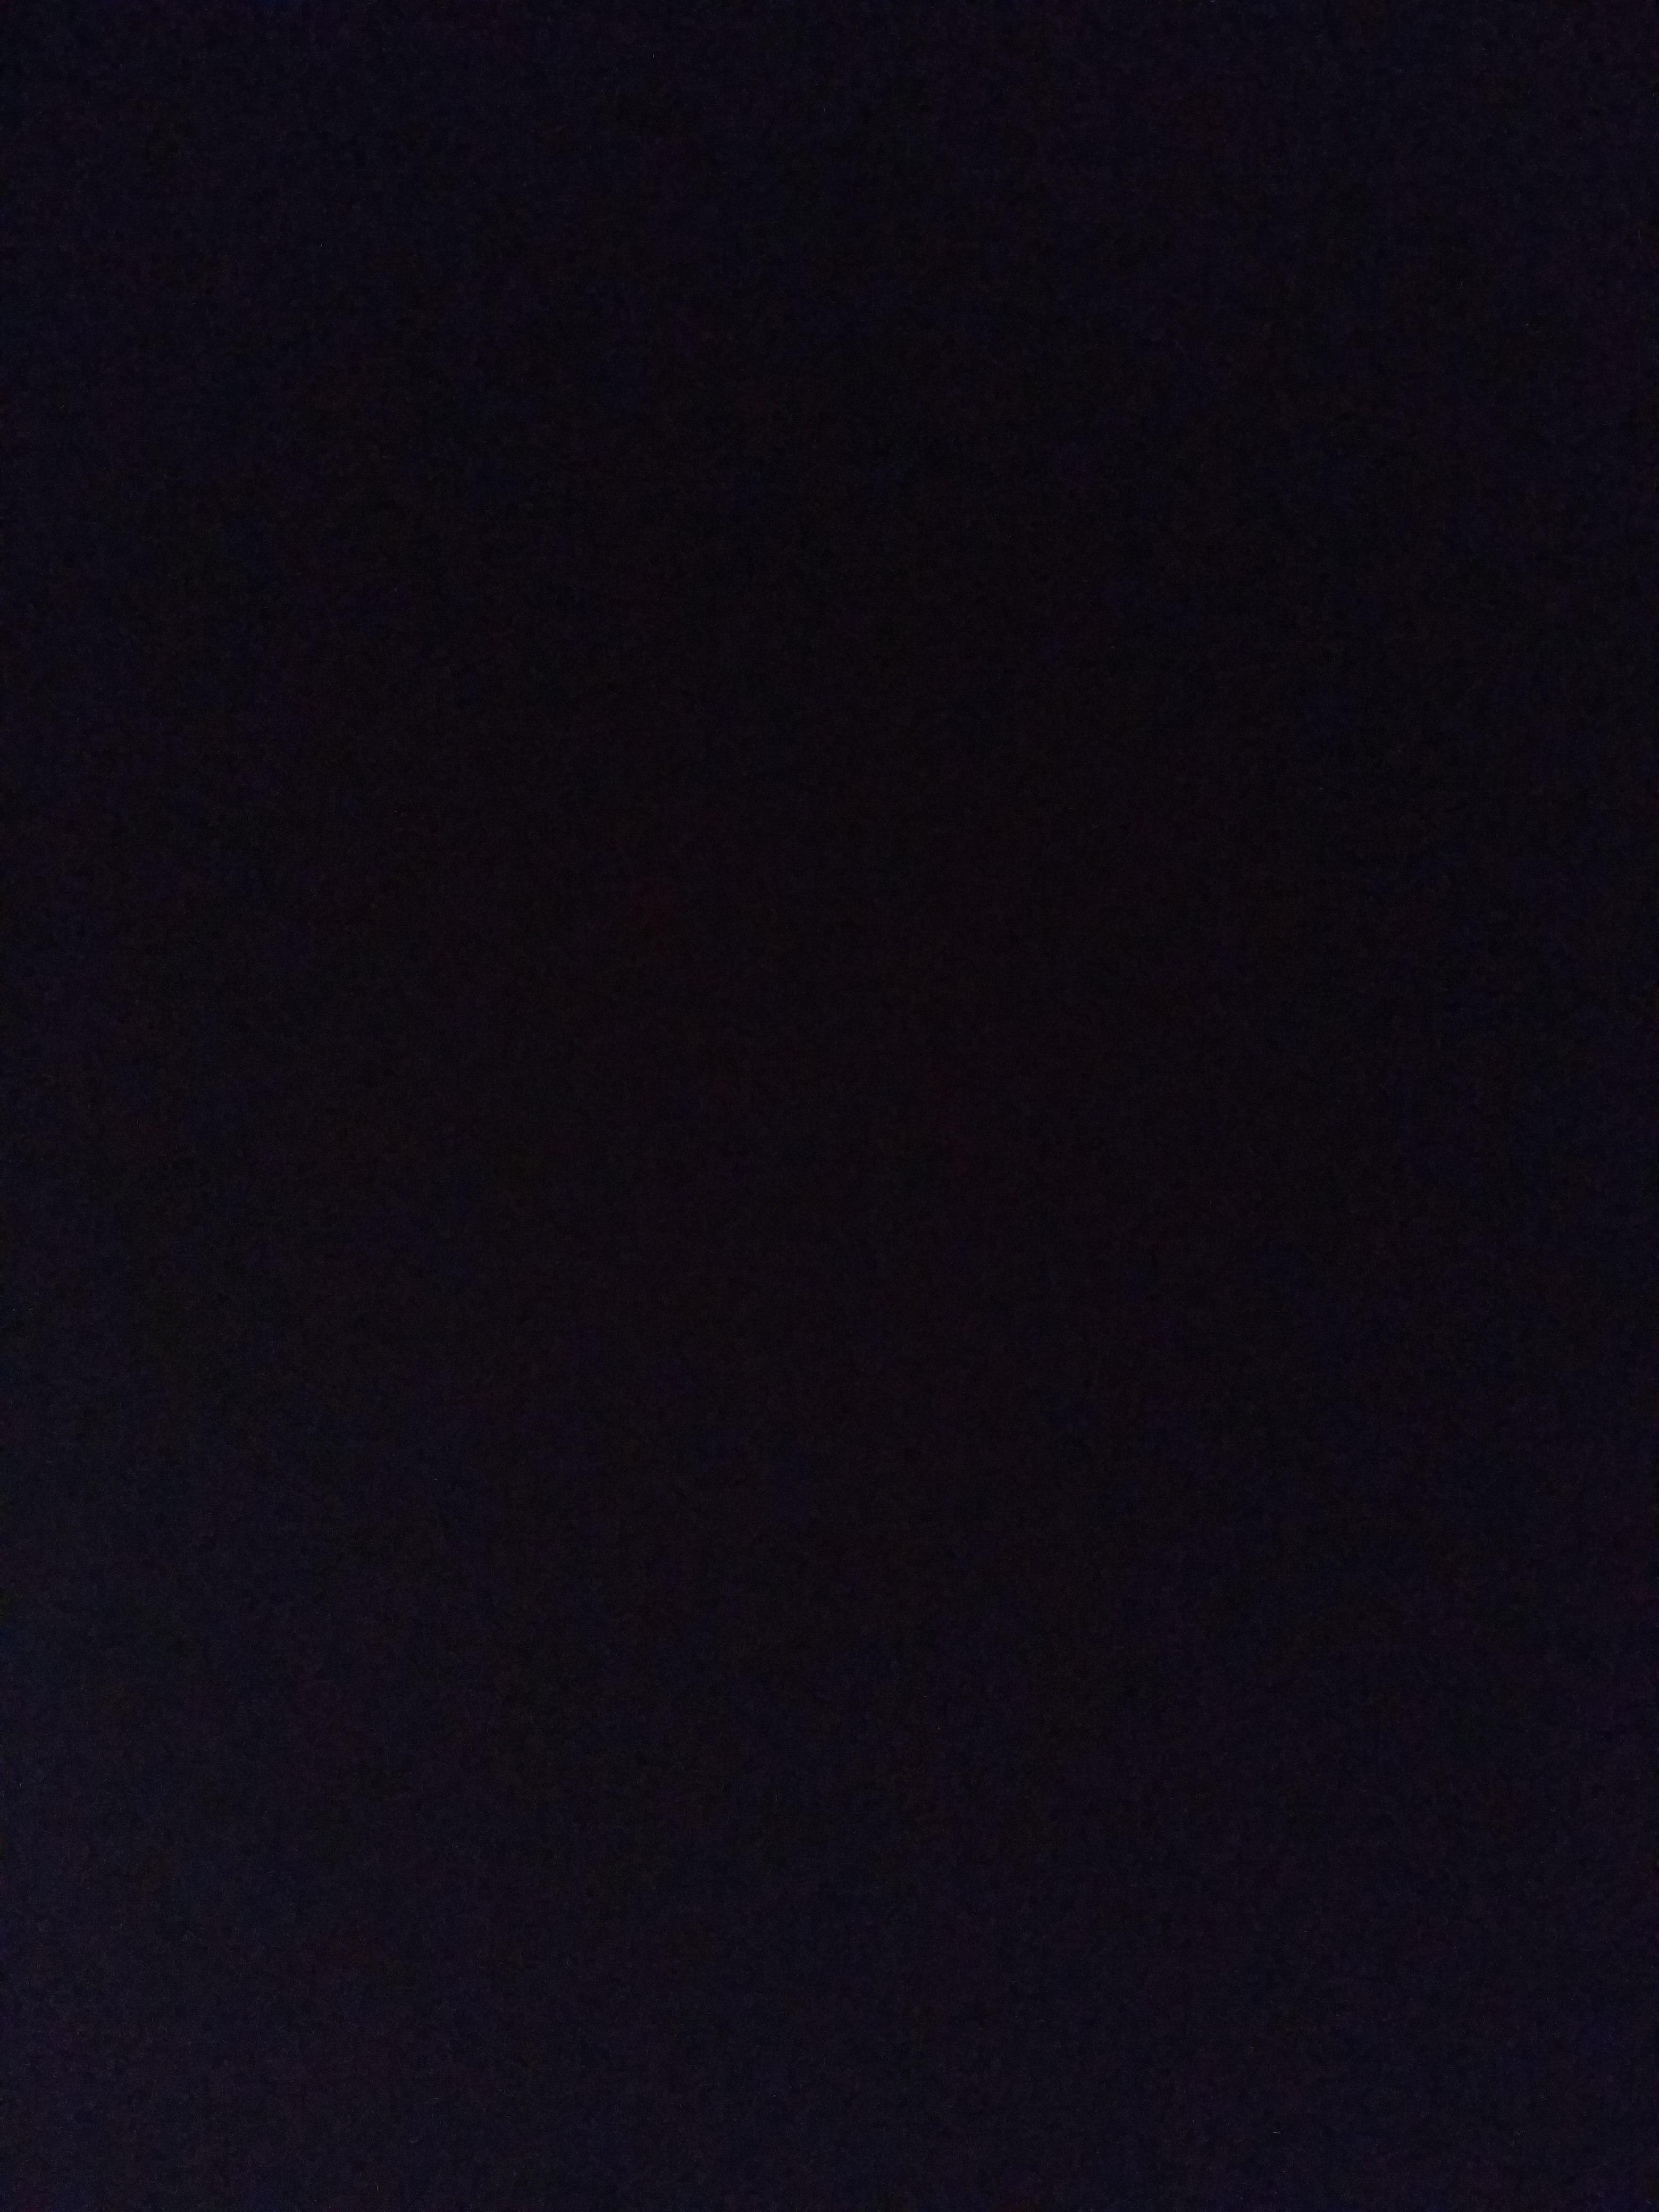 MohamedM Profile Picture